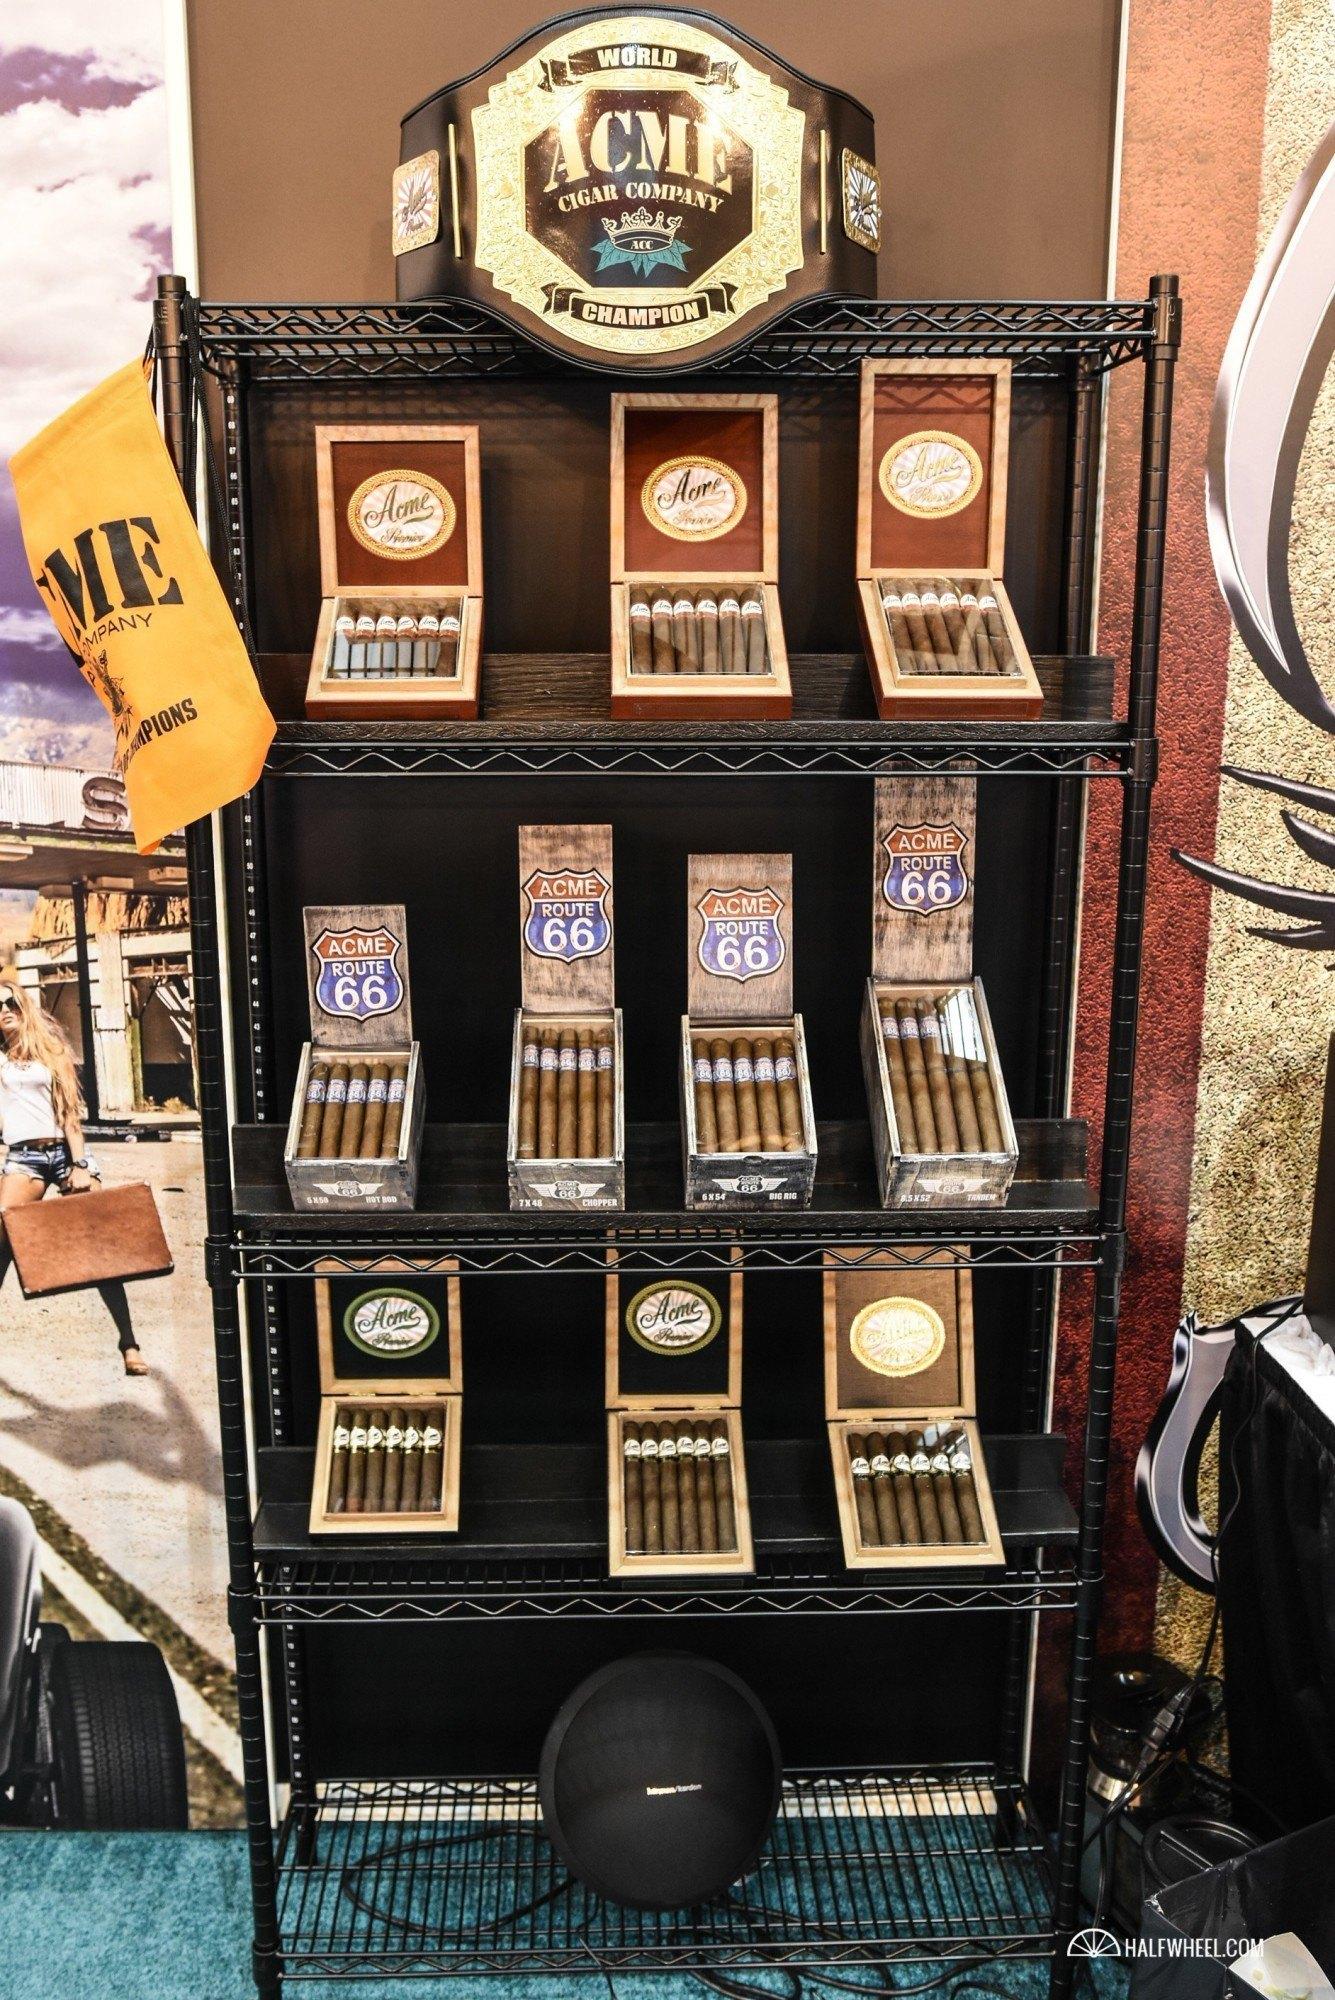 Acme Cigars